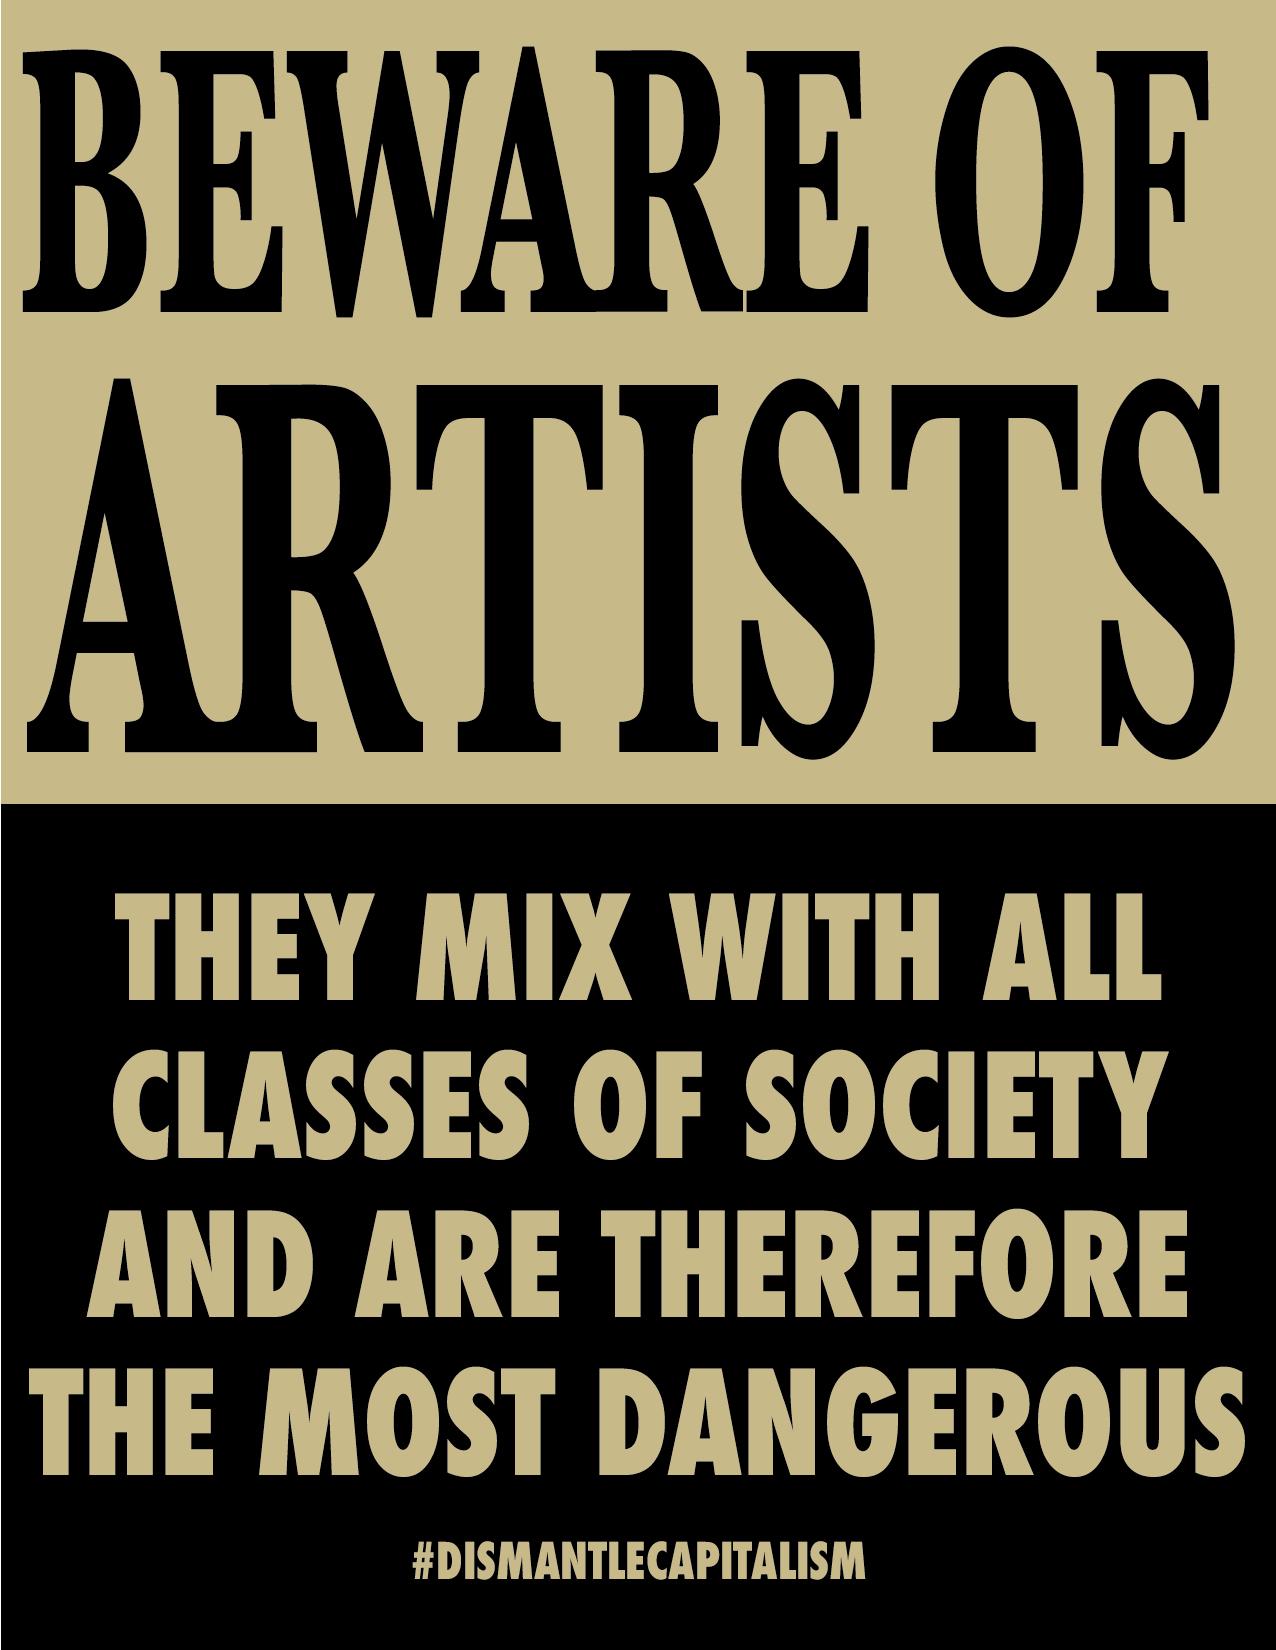 artist dismantle capitalism posters propoganda-03.jpg